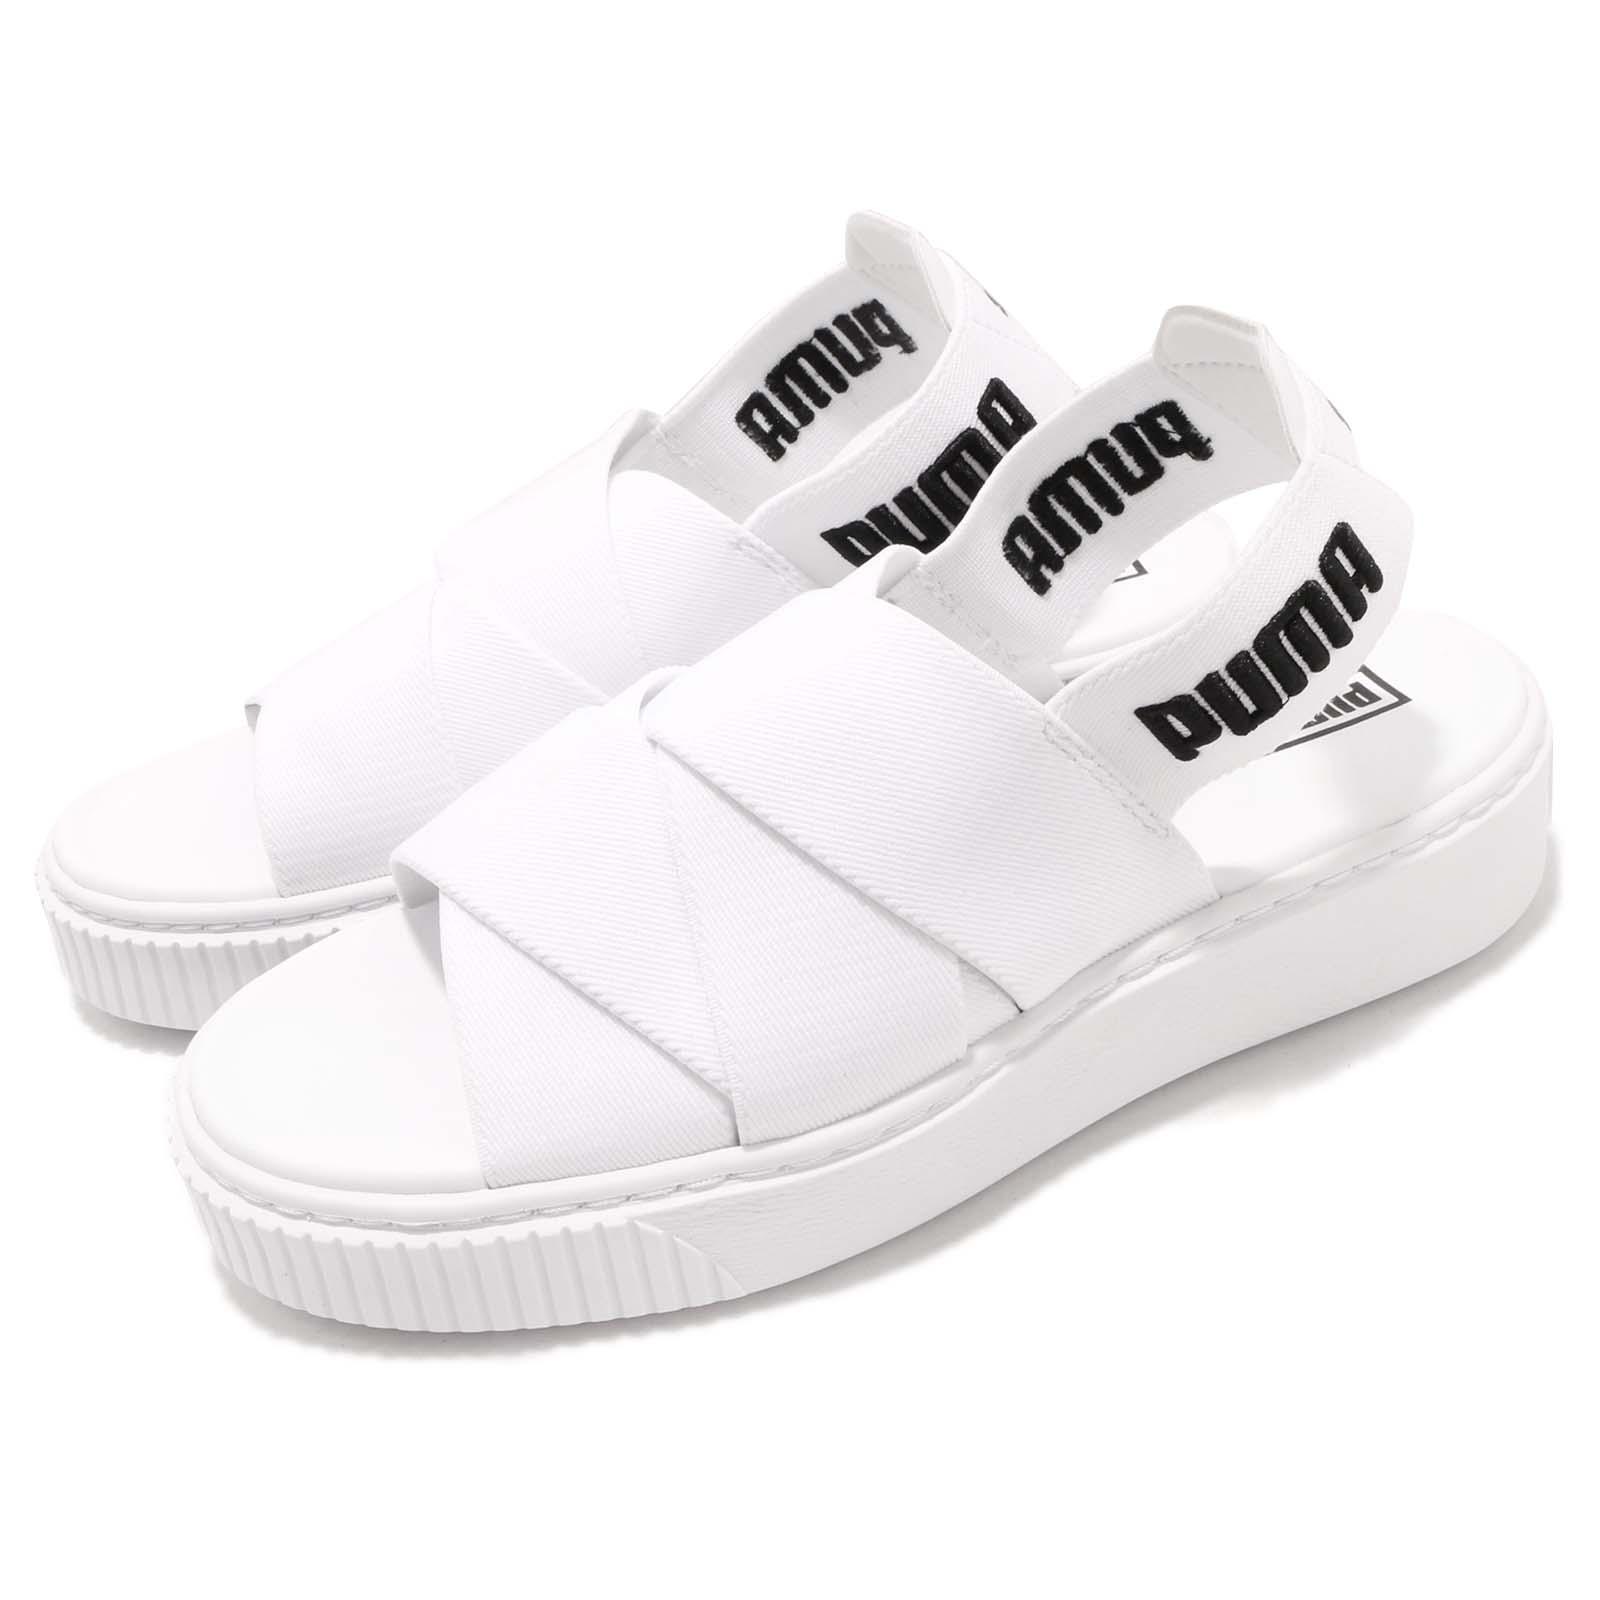 Puma 涼拖鞋 Platform Sandal 女鞋 36547802